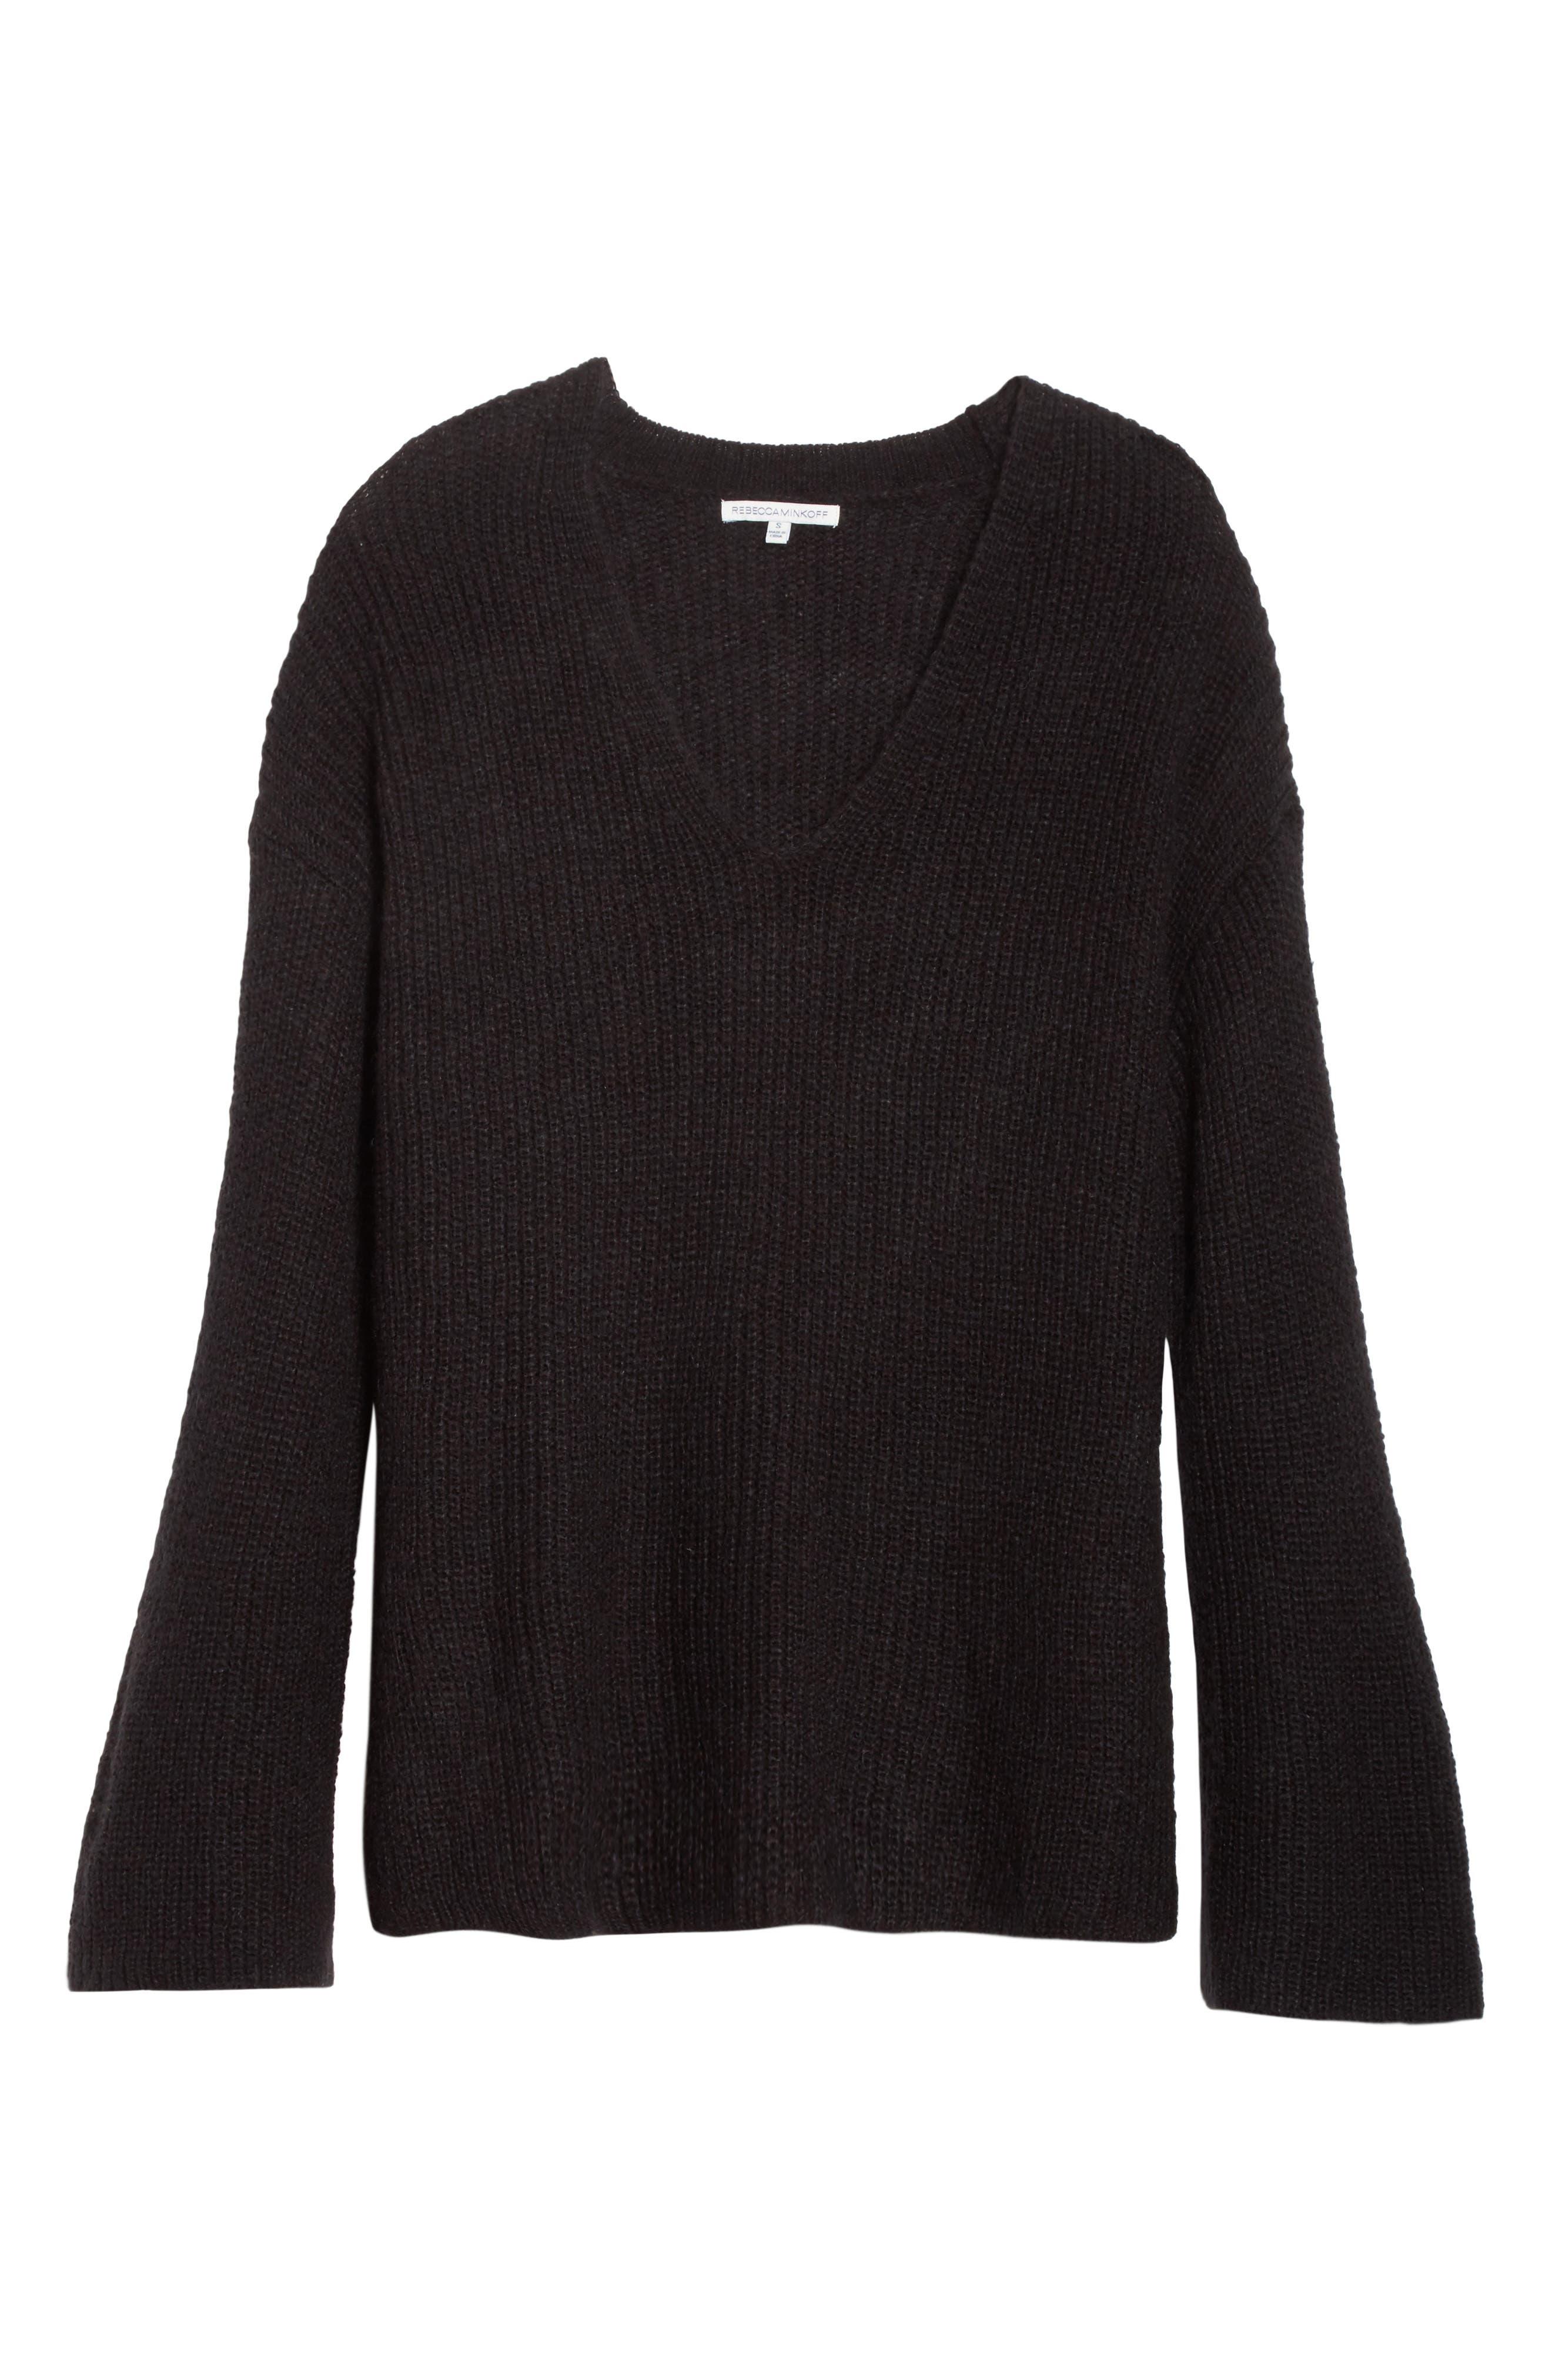 Remi Oversize Sweater,                             Alternate thumbnail 6, color,                             001